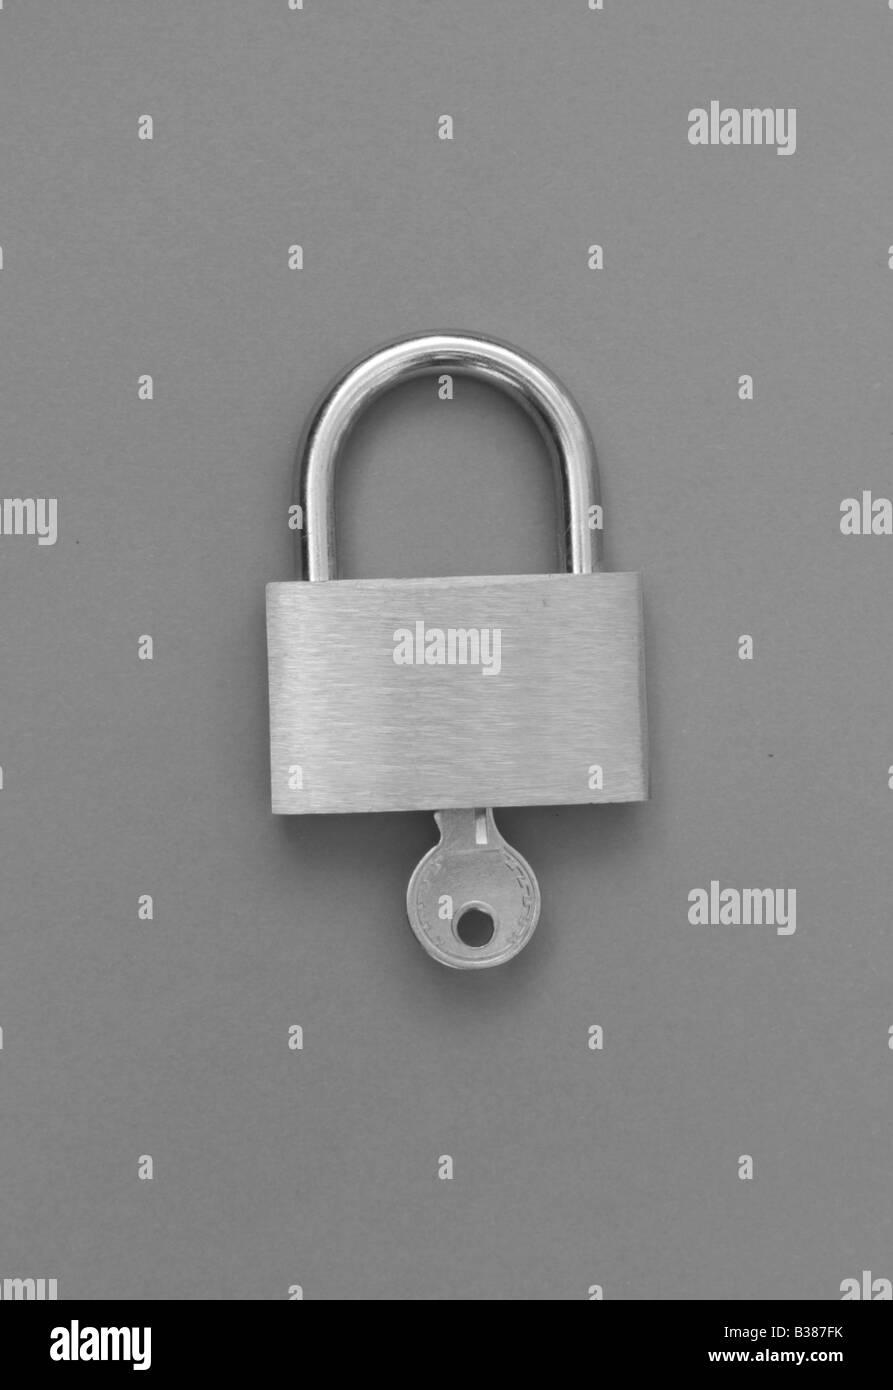 padlock, lock, 3, three, secure, security, safe, - Stock Image